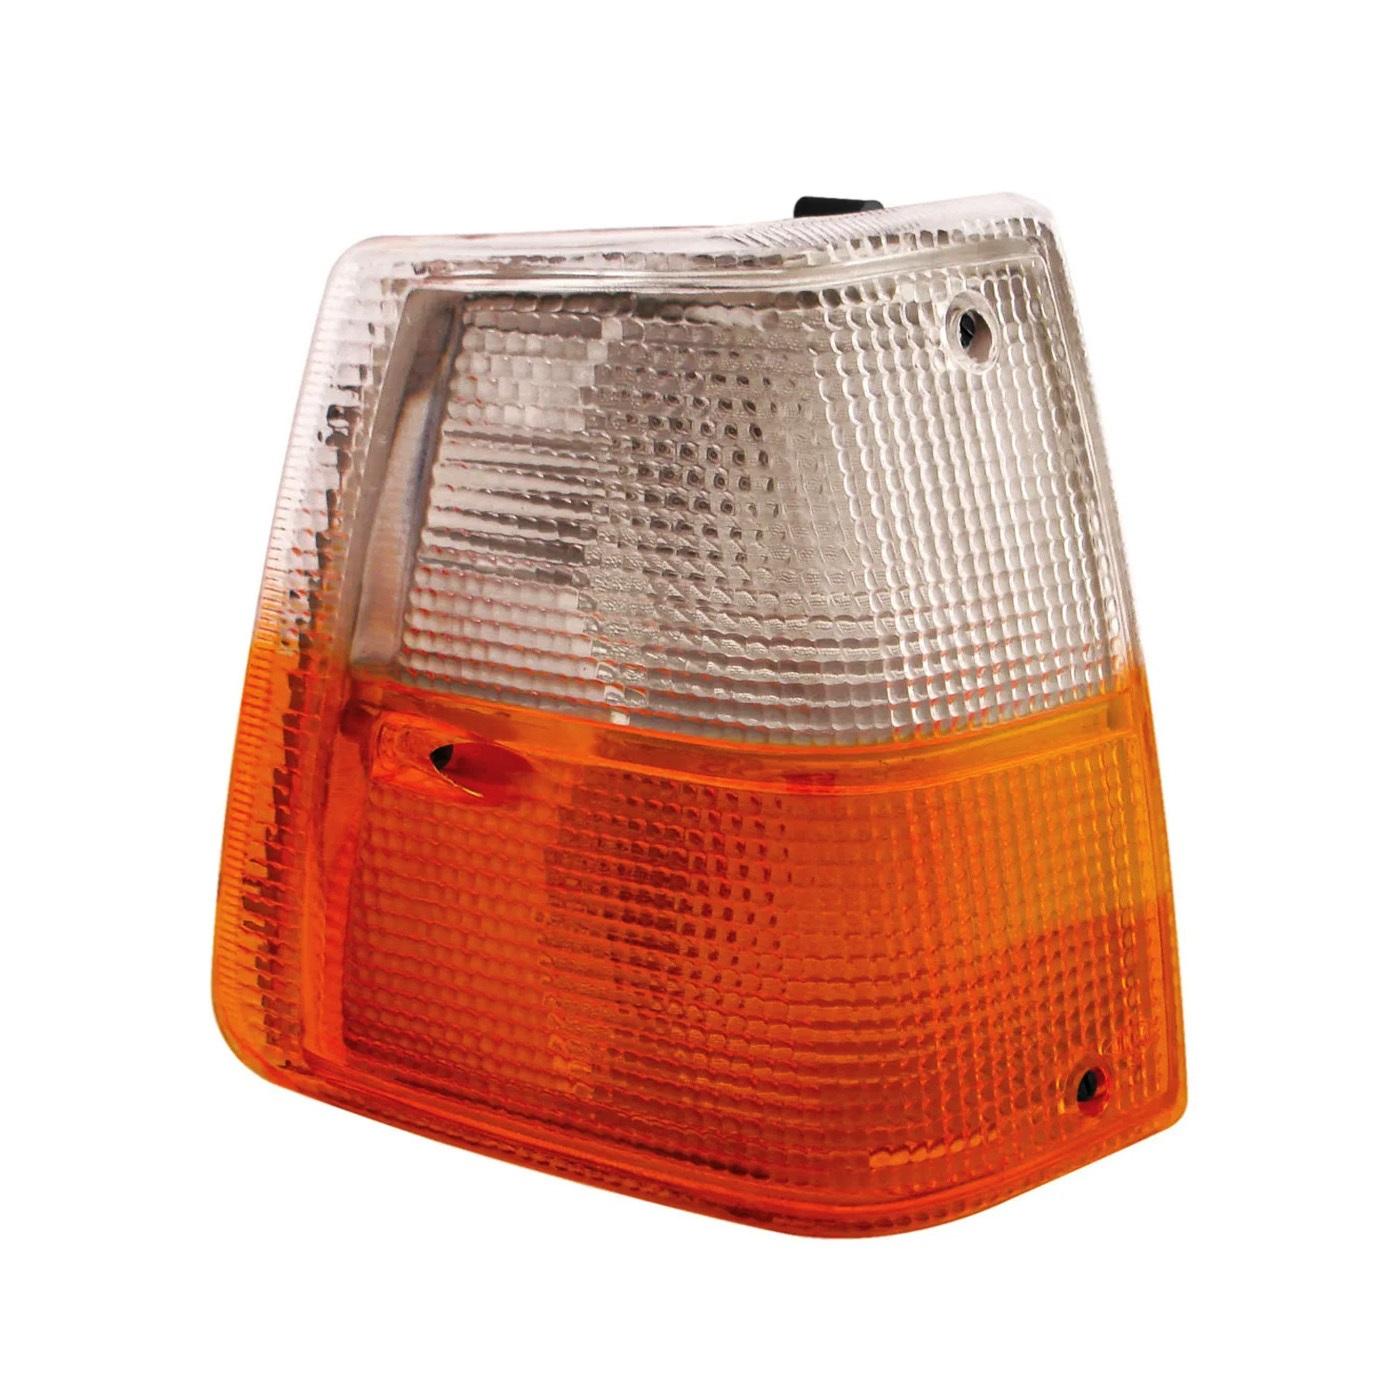 Lanterna Seta Volvo Nl Edc De 1992 A 1999 - Dianteira